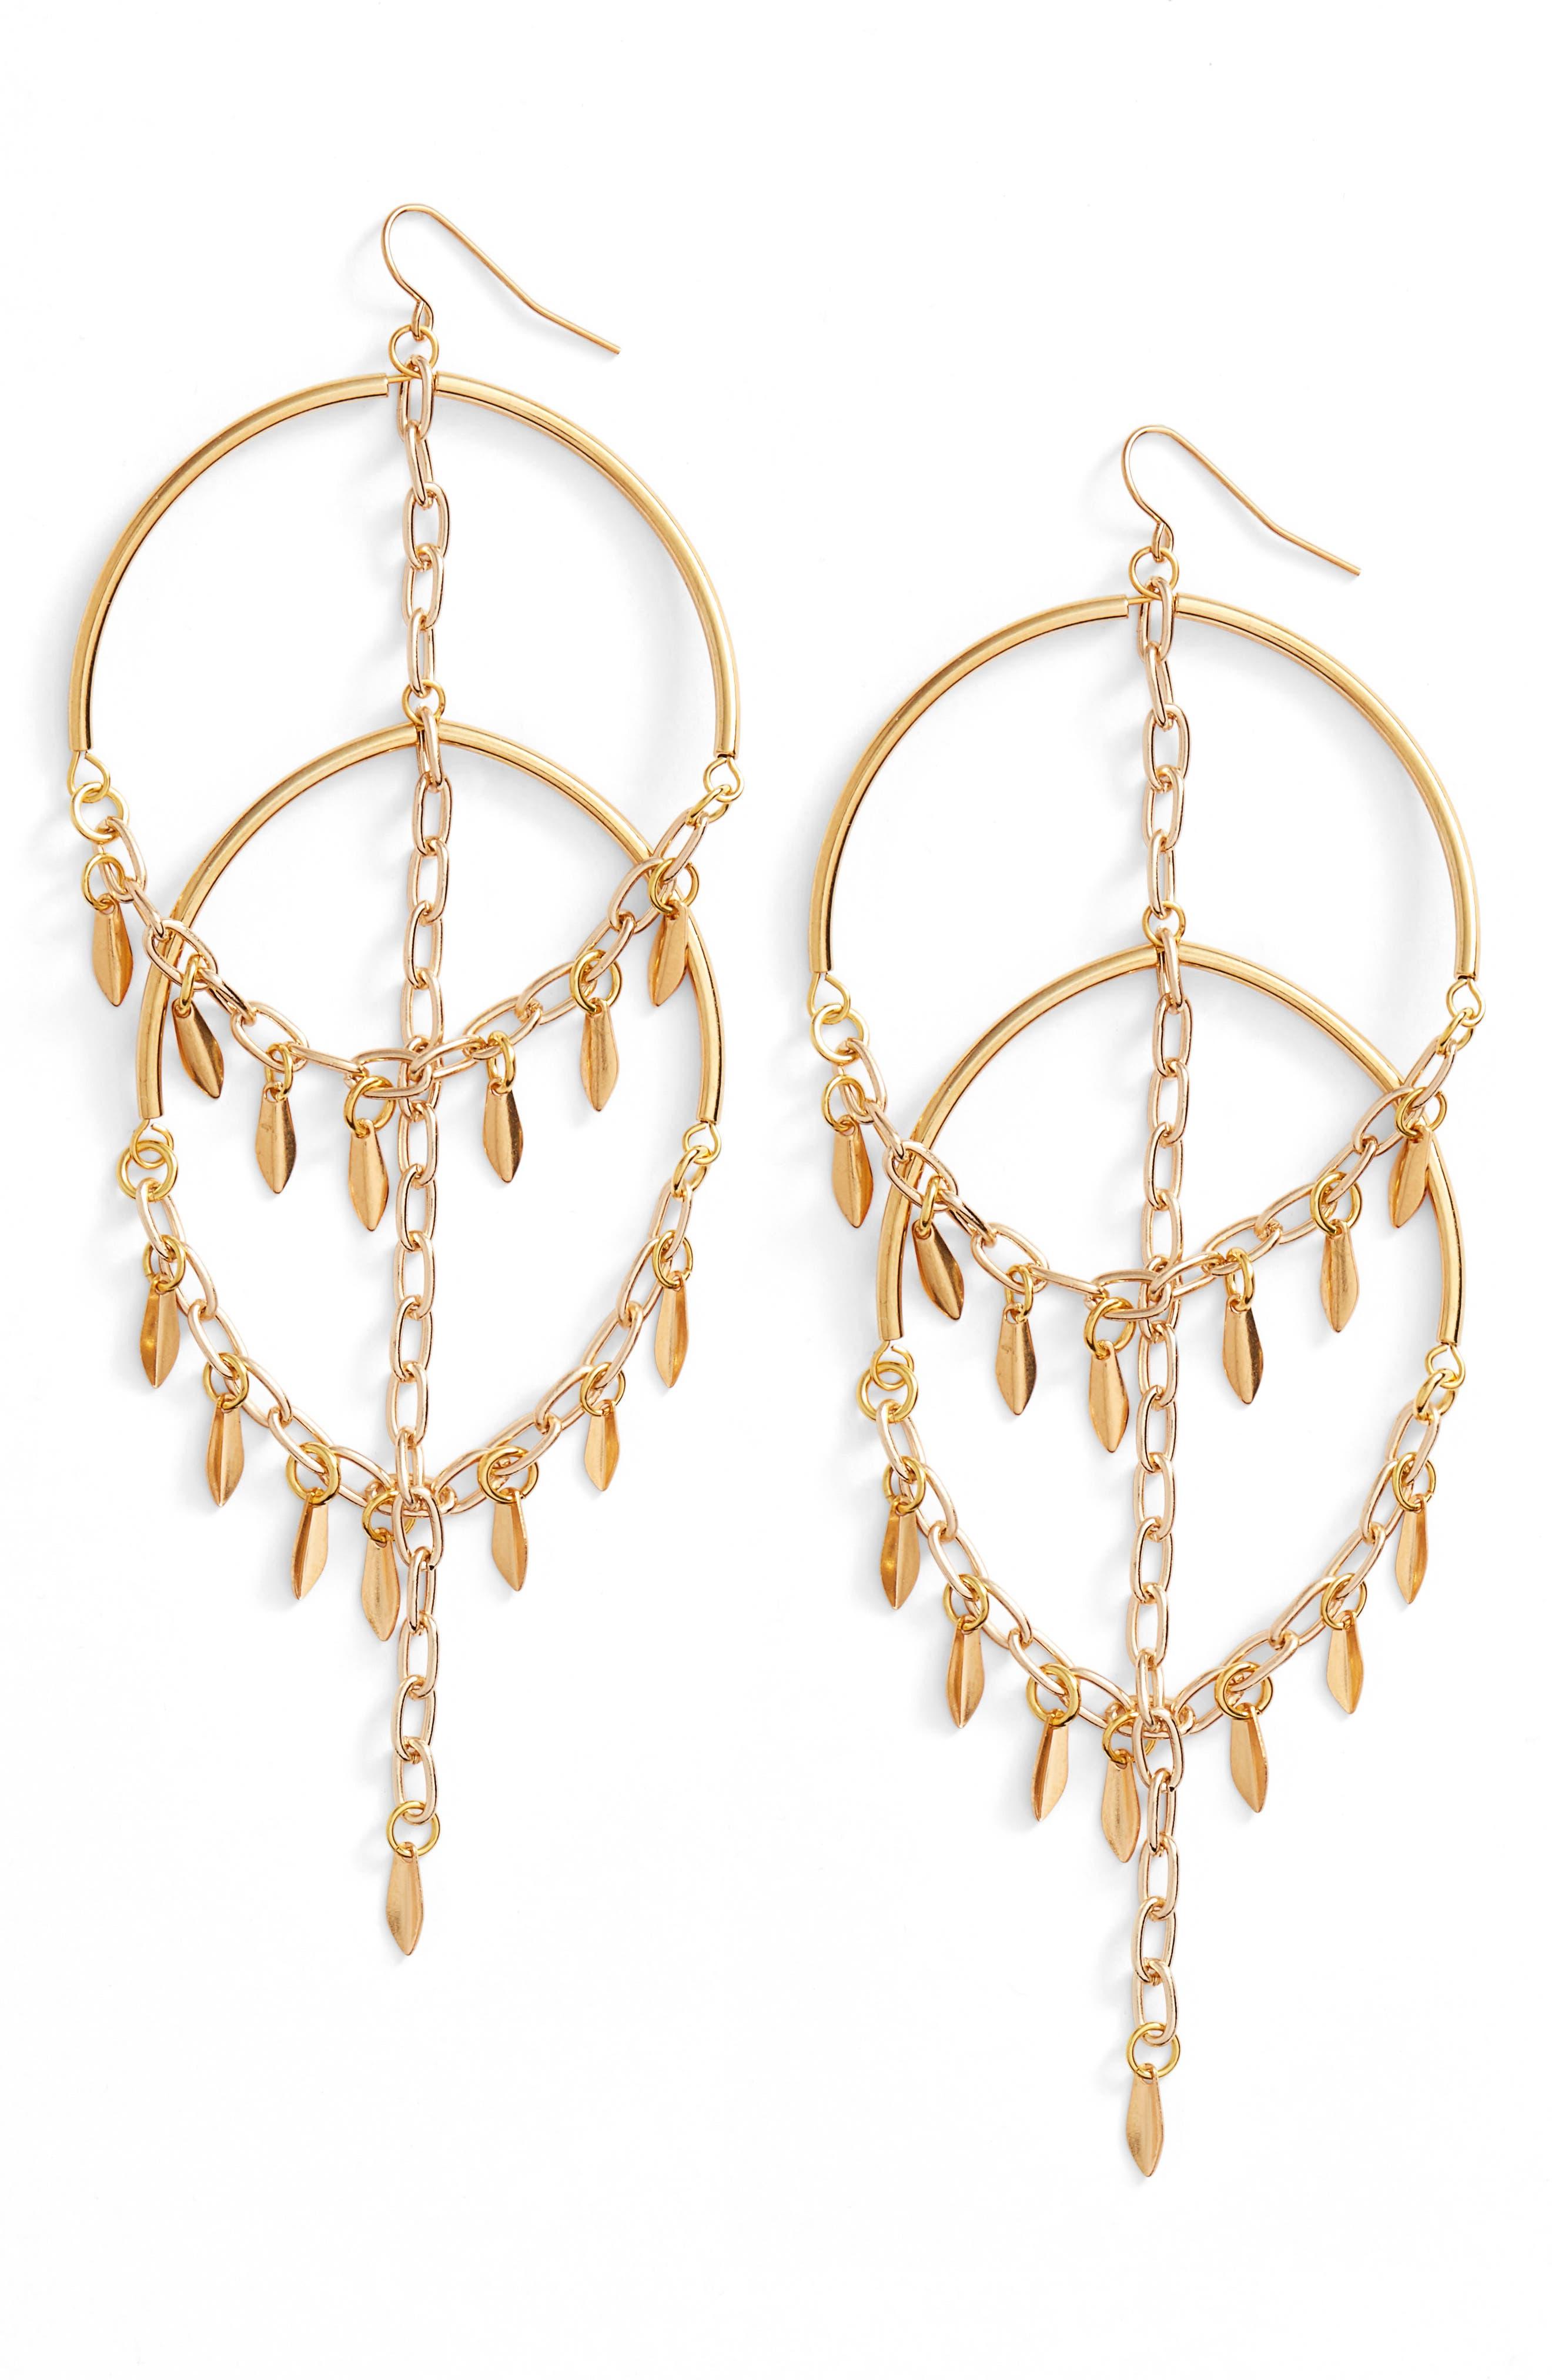 VANESSA MOONEY Cannes Chandelier Earrings